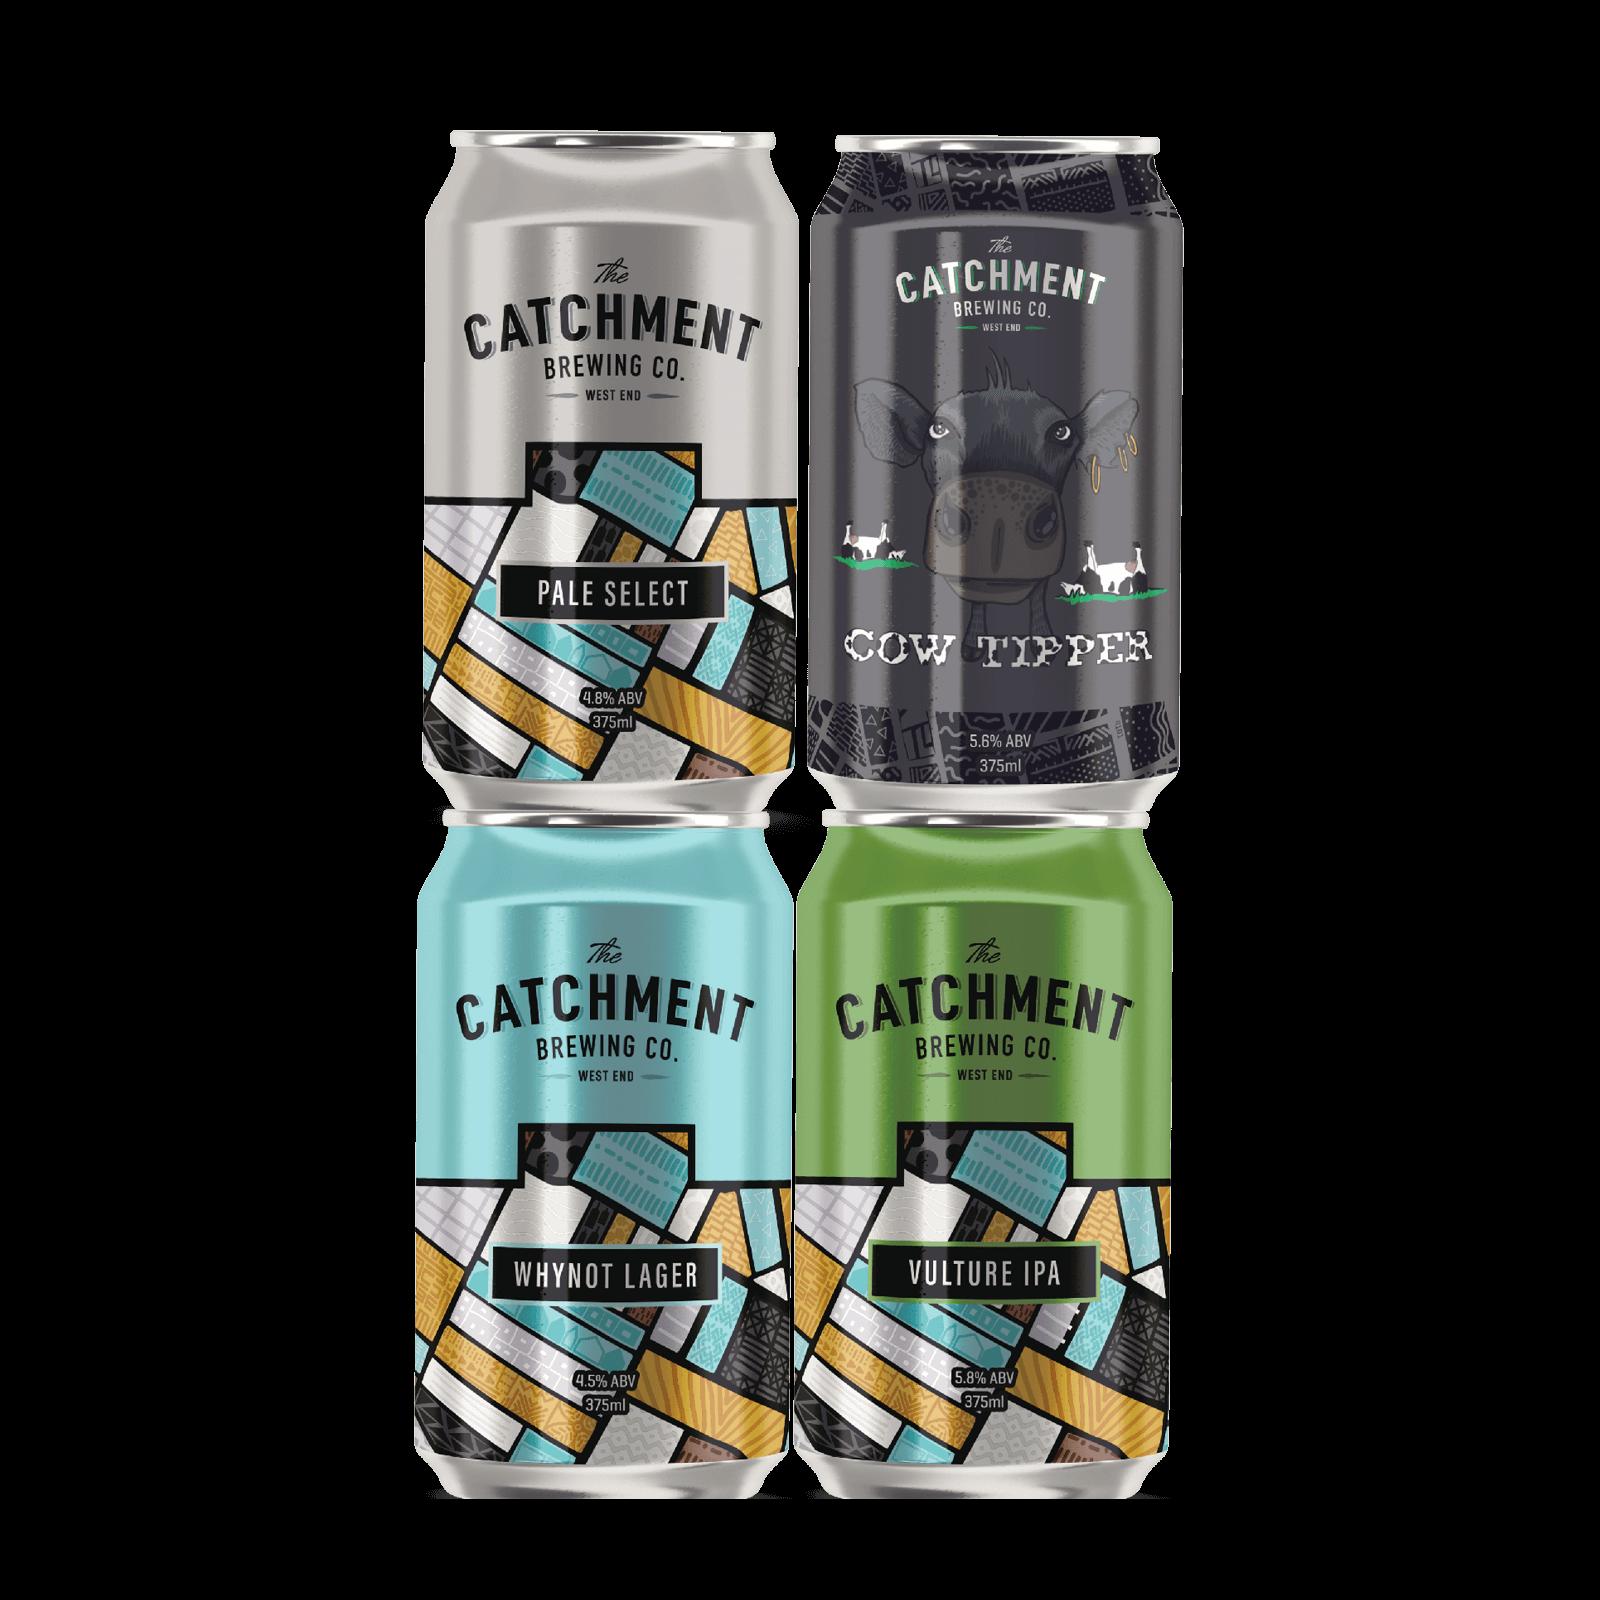 Catchment Premium Collection (16x)